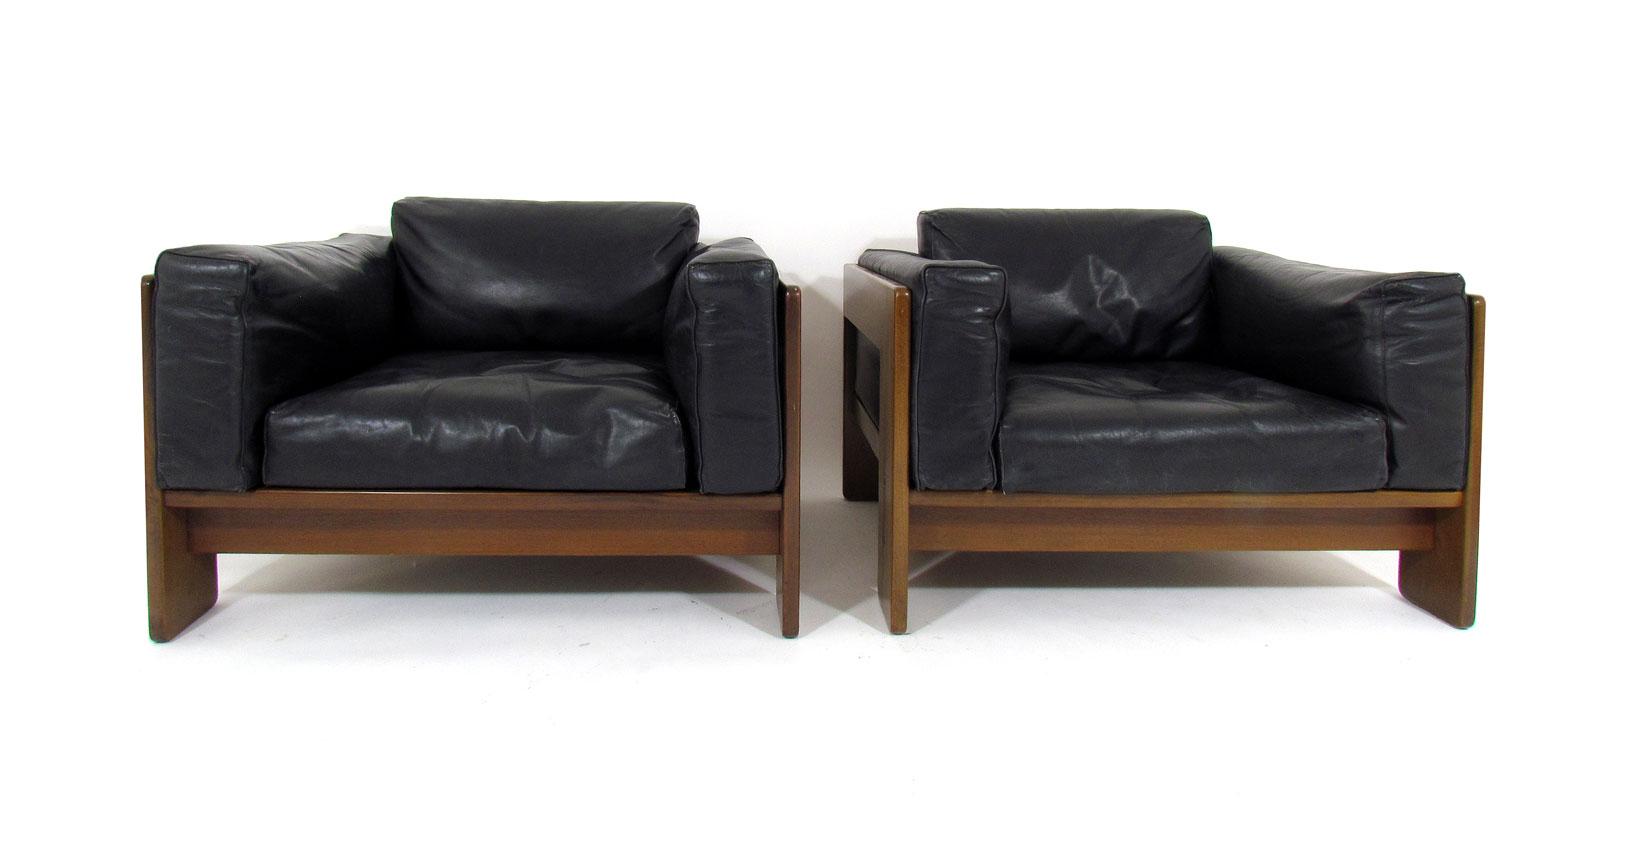 bastiano armchair tobia scarpa gavina knoll design vintage iconicdesign leather pelle furniture